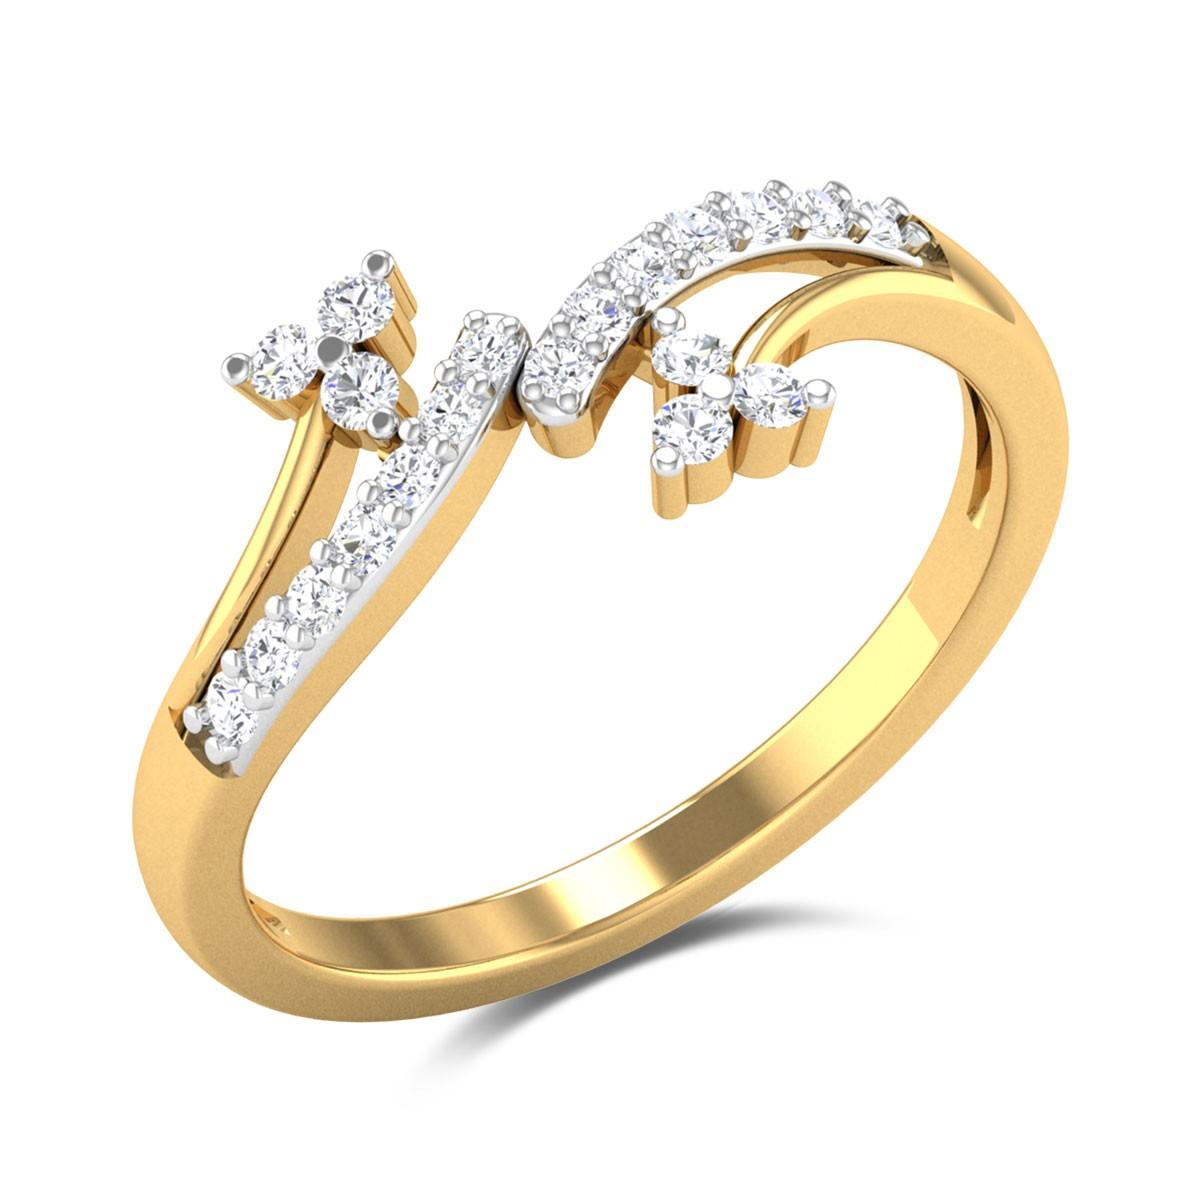 Eavan Diamond Ring